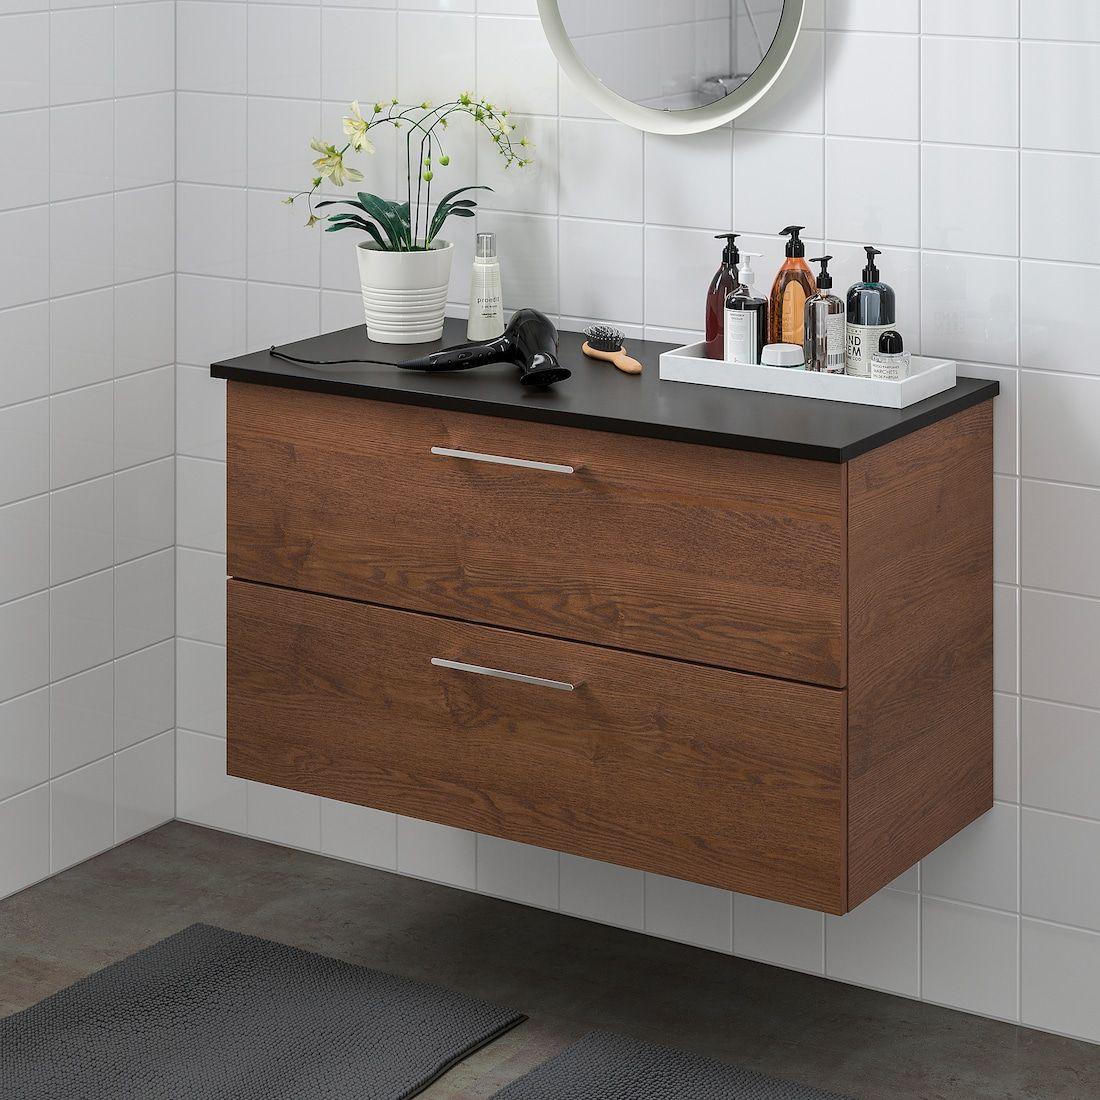 Godmorgon Tolken Meuble Lavabo 2tir Motif Frene Effet Brun Moyen Anthracite 102x49x60 Cm Ikea Sink Cabinet Ikea Godmorgon Ikea